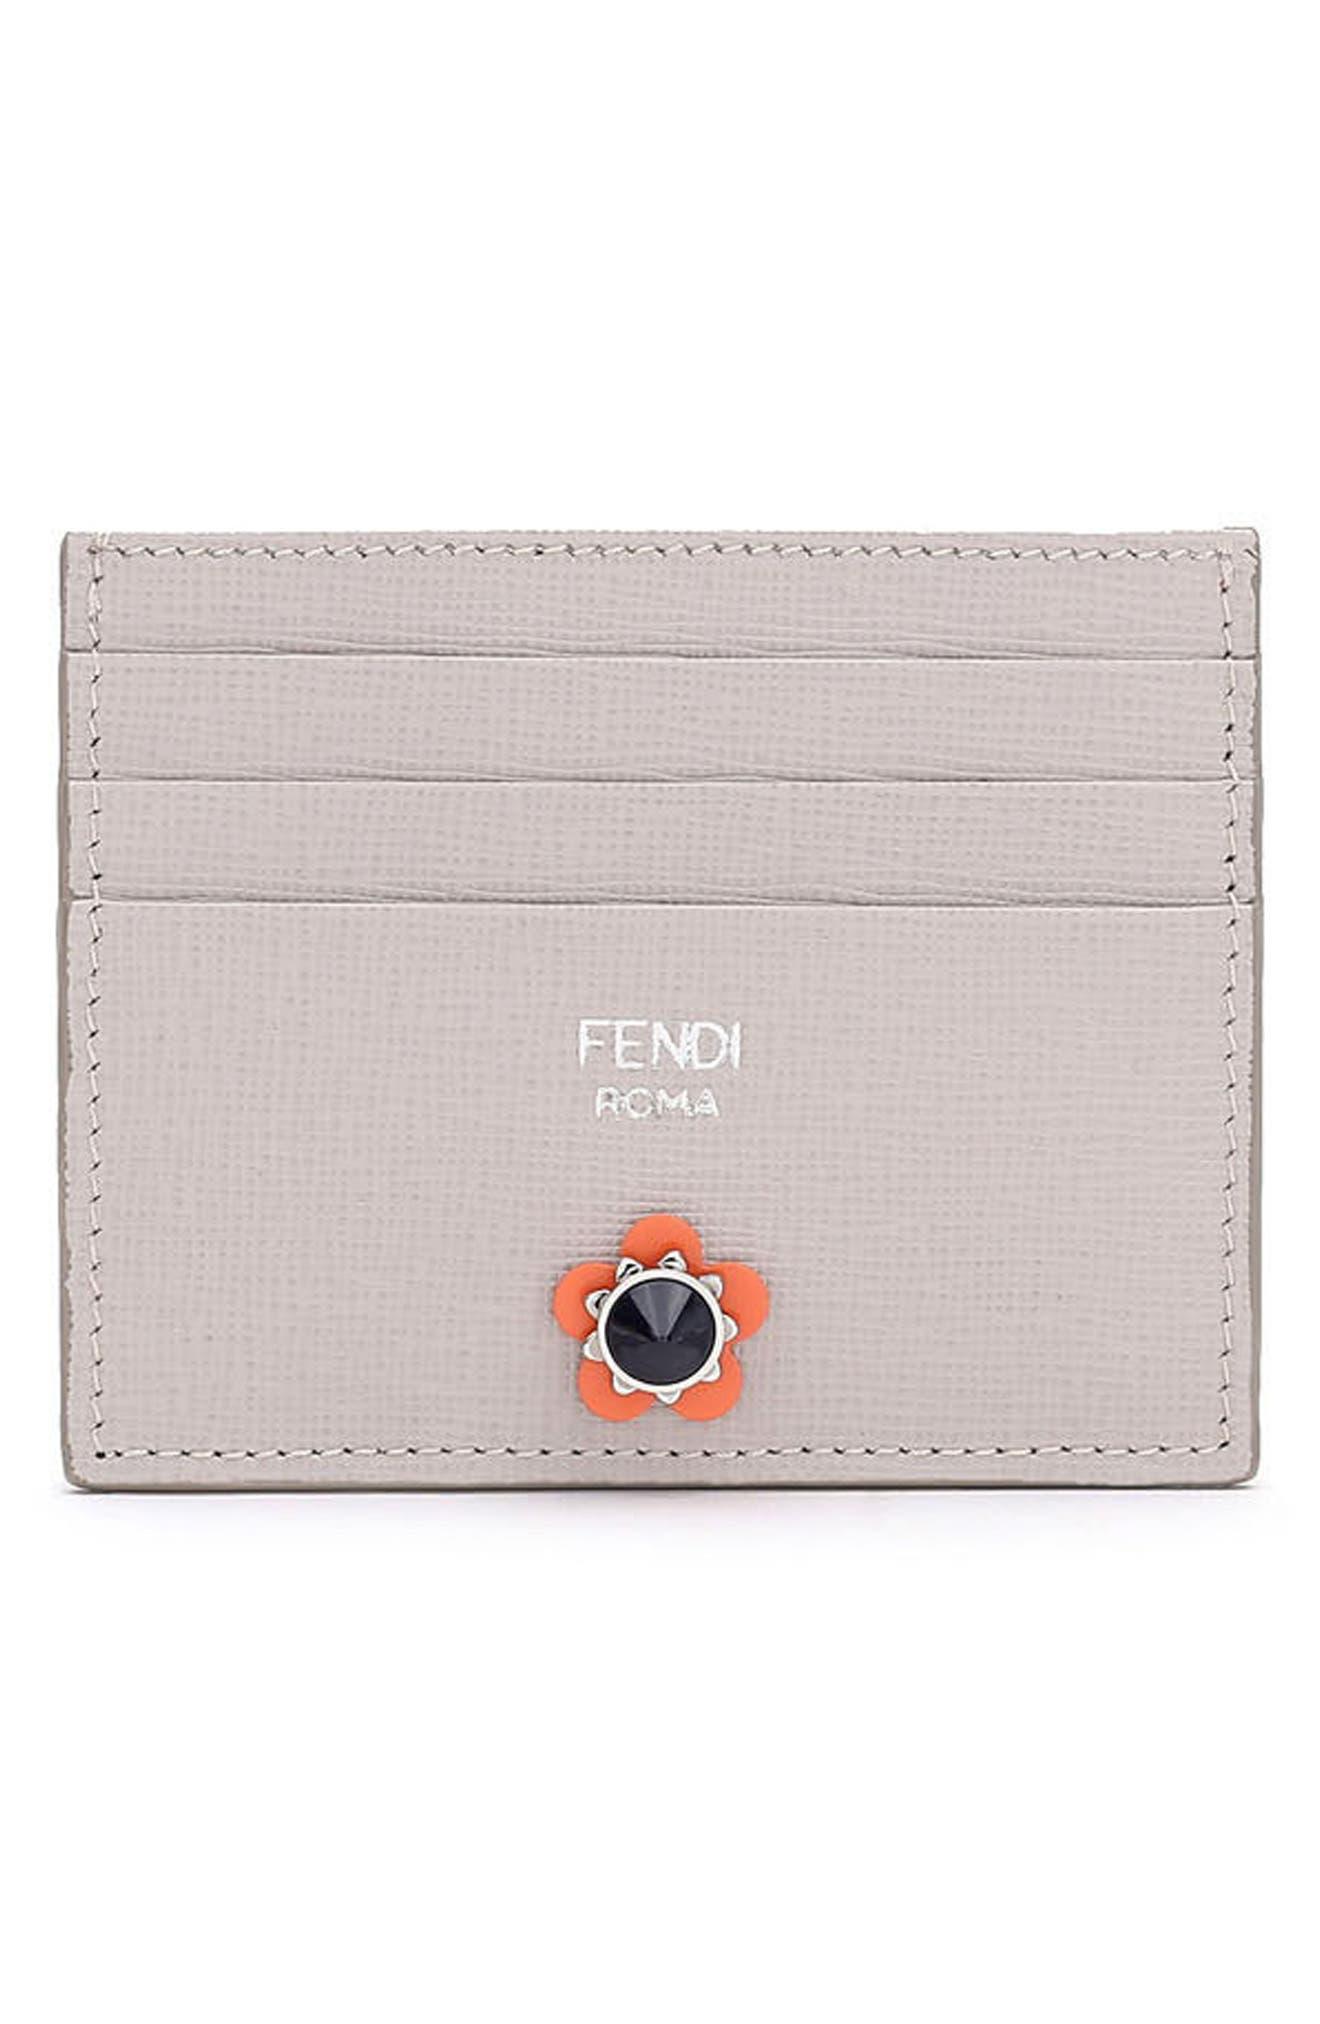 Fendi Flowerland Elite Leather Card Case